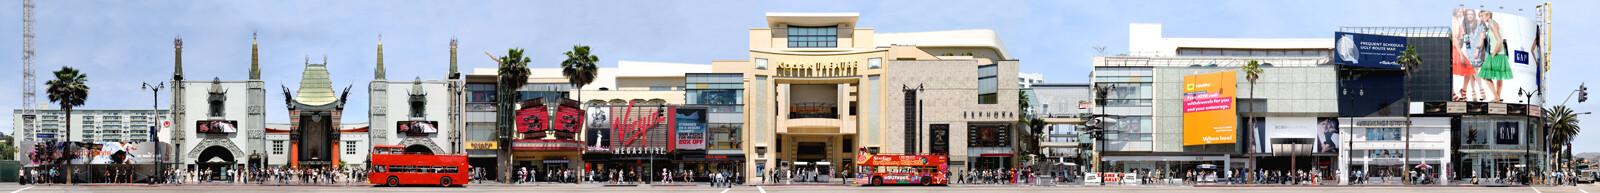 Hollywood Boulevard #3, LA - Larry Yust